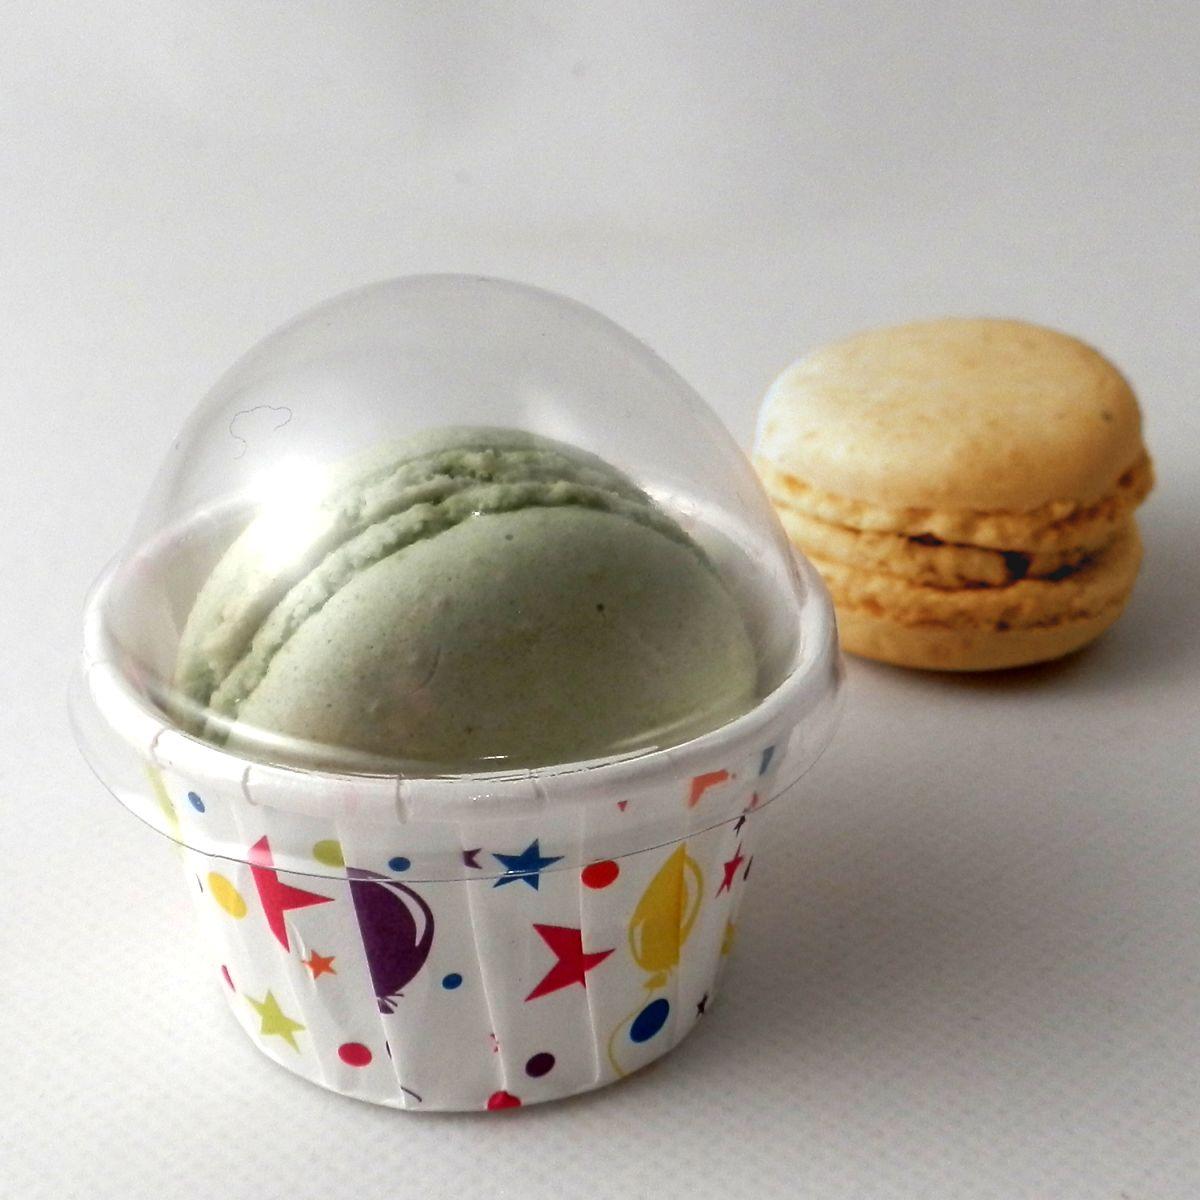 macaron-paper-domes-1200-7.jpg